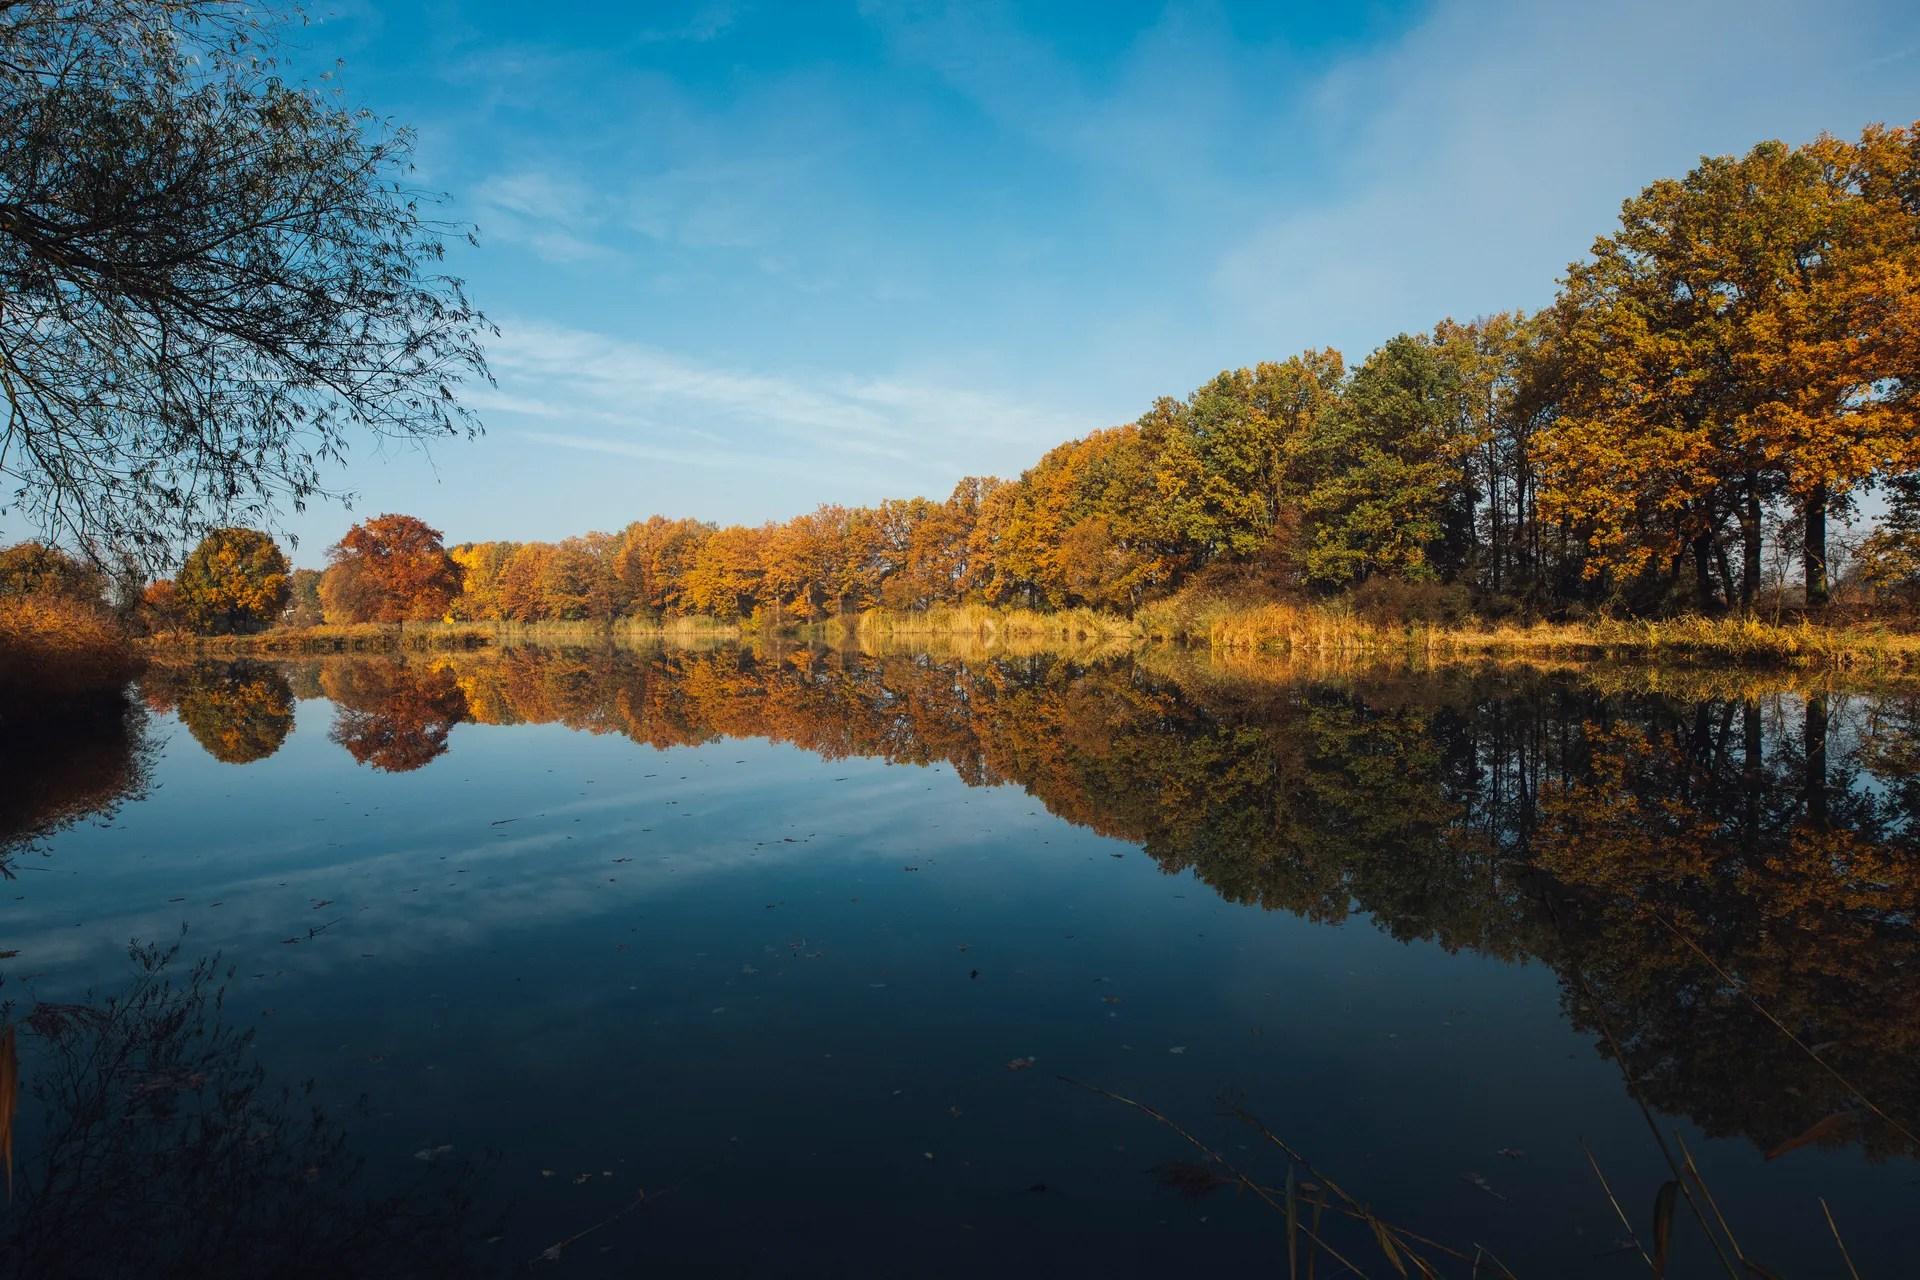 Windows 10 Fall Usa Wallpapers 4k Rainy Night In New York City Widescreen Wallpaper Wide